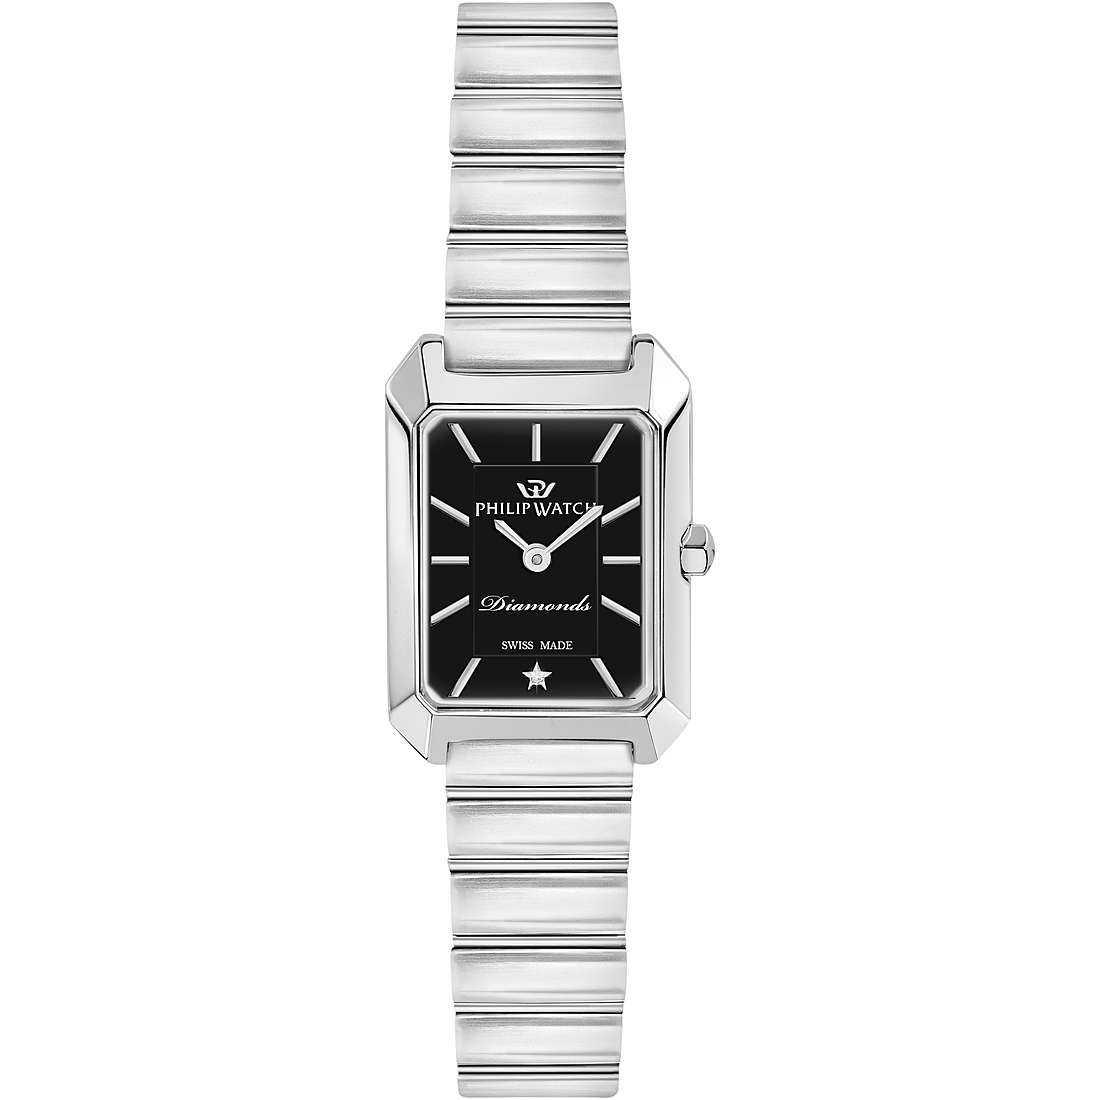 Orologio philip watch r8253499506